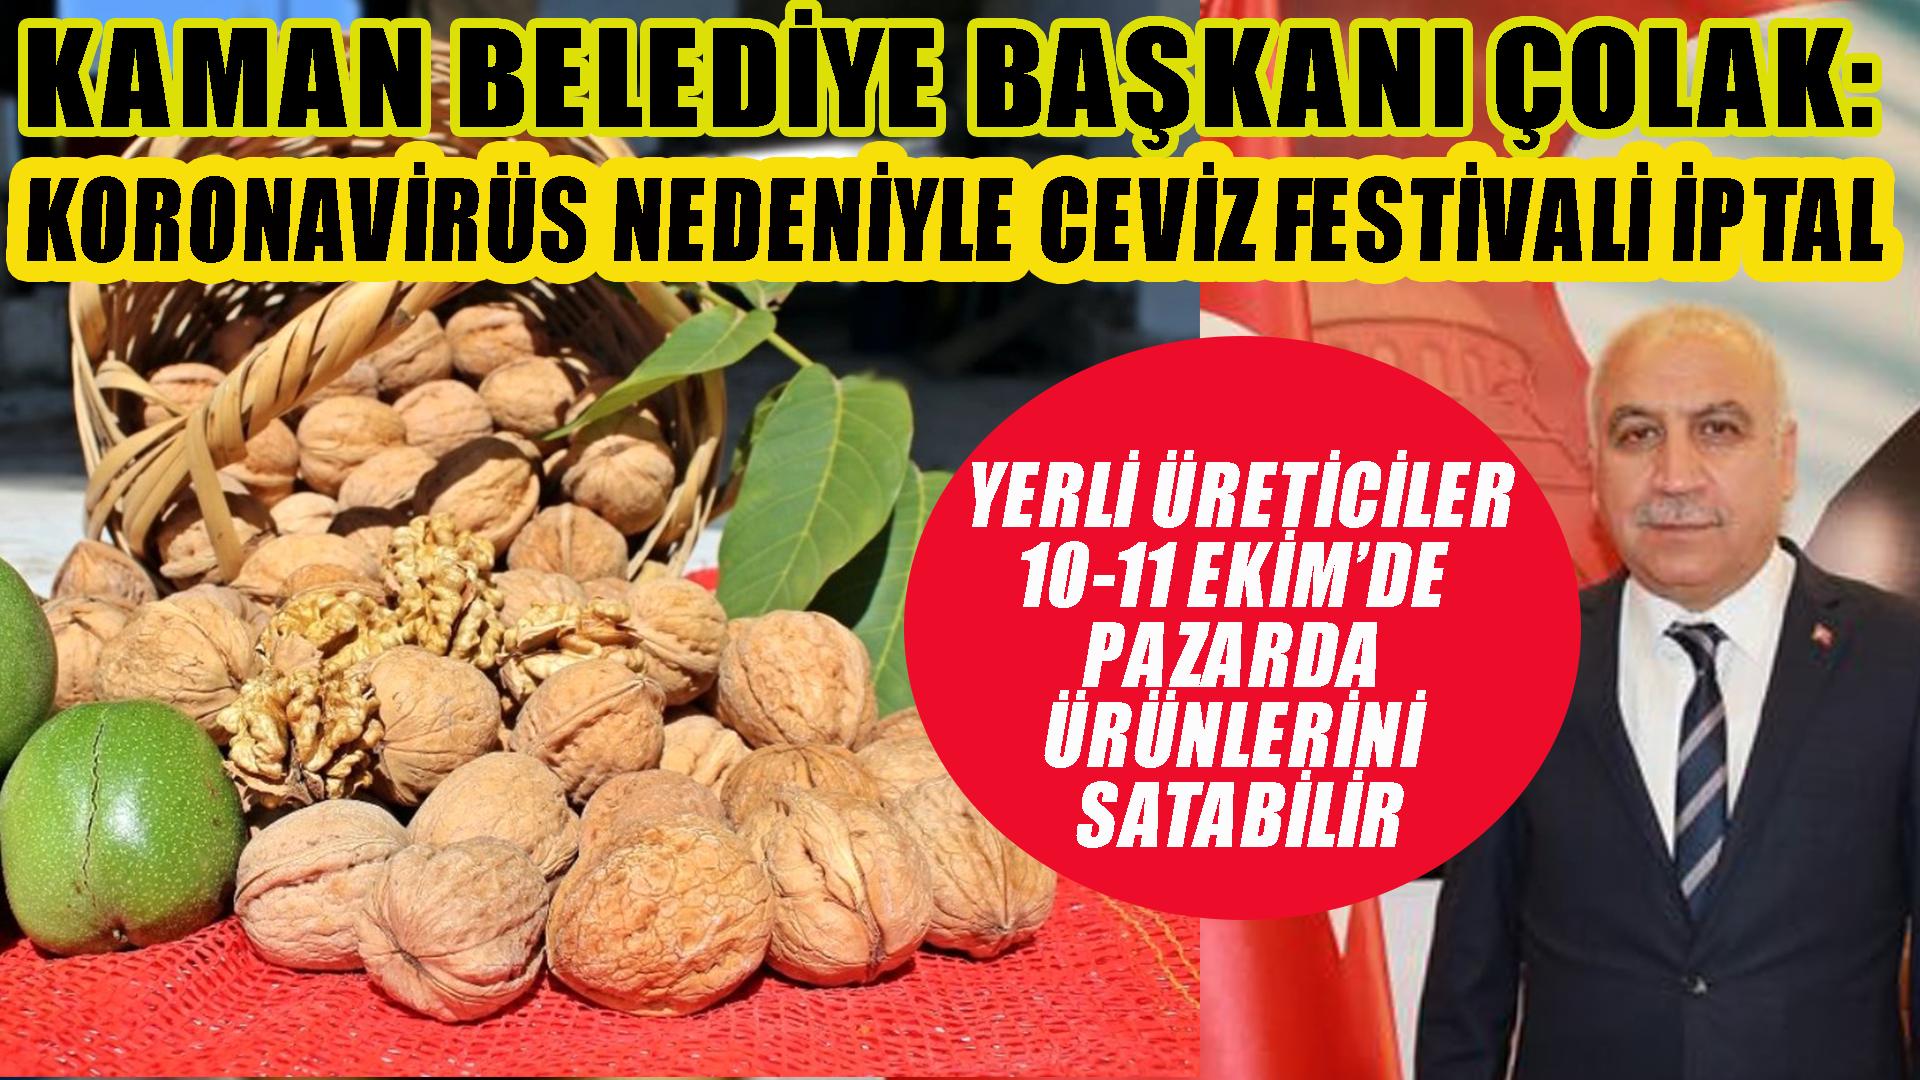 Kaman Ceviz Festivali koronavirüs nedeniyle iptal